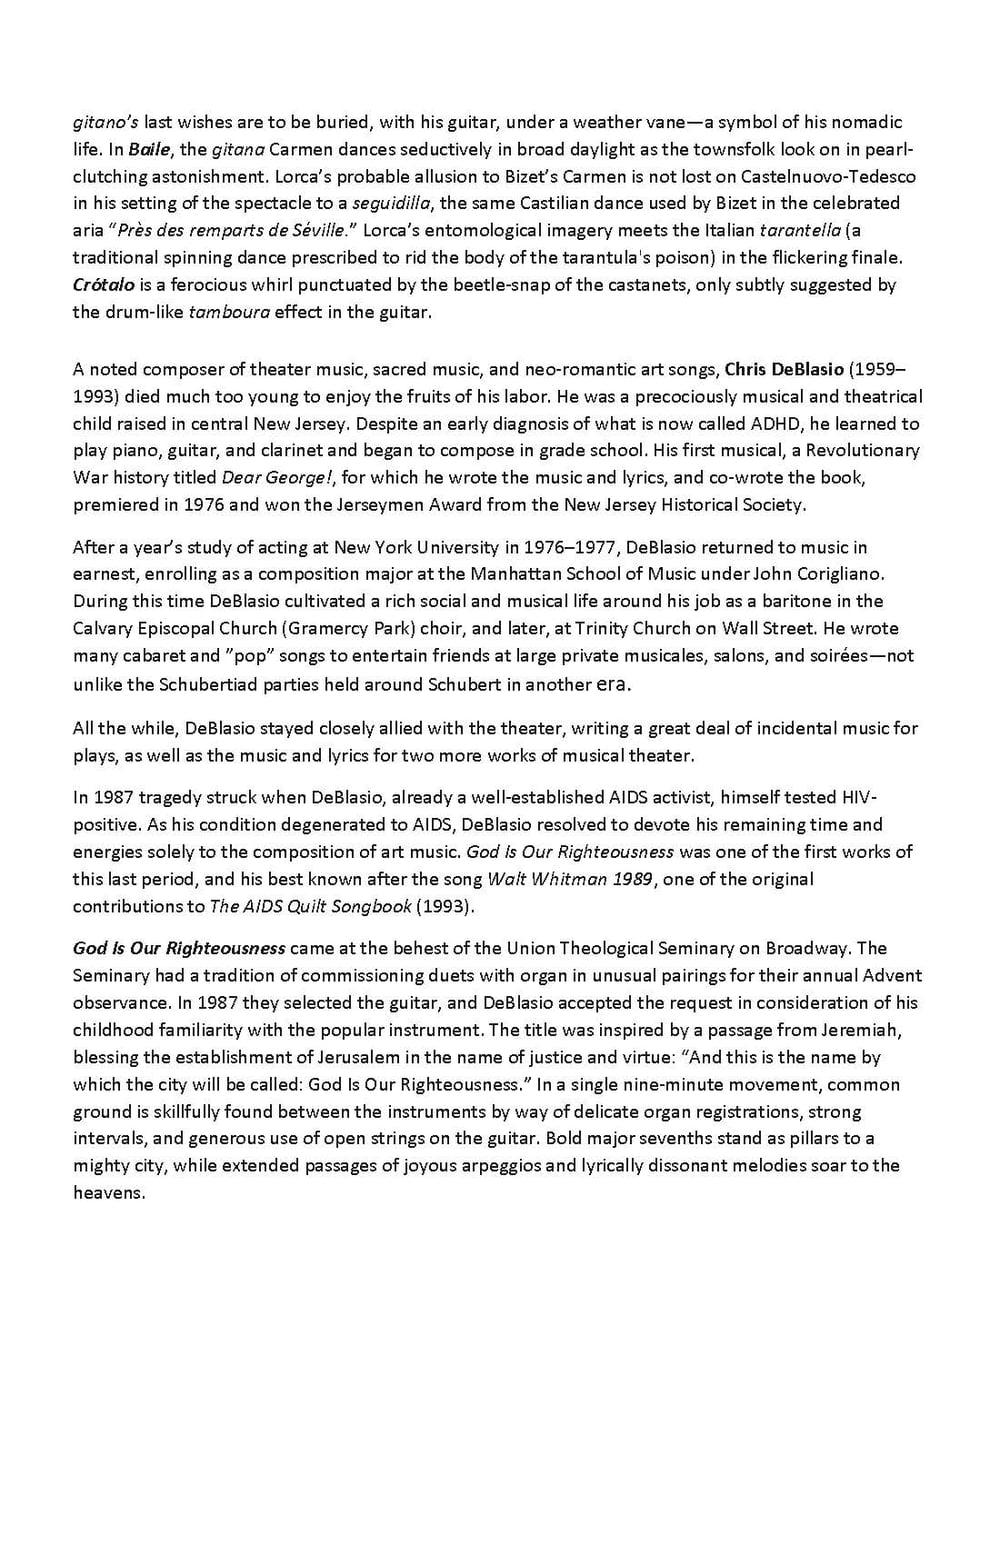 webPROGRAMnotes1-10-16_Page_3.jpg